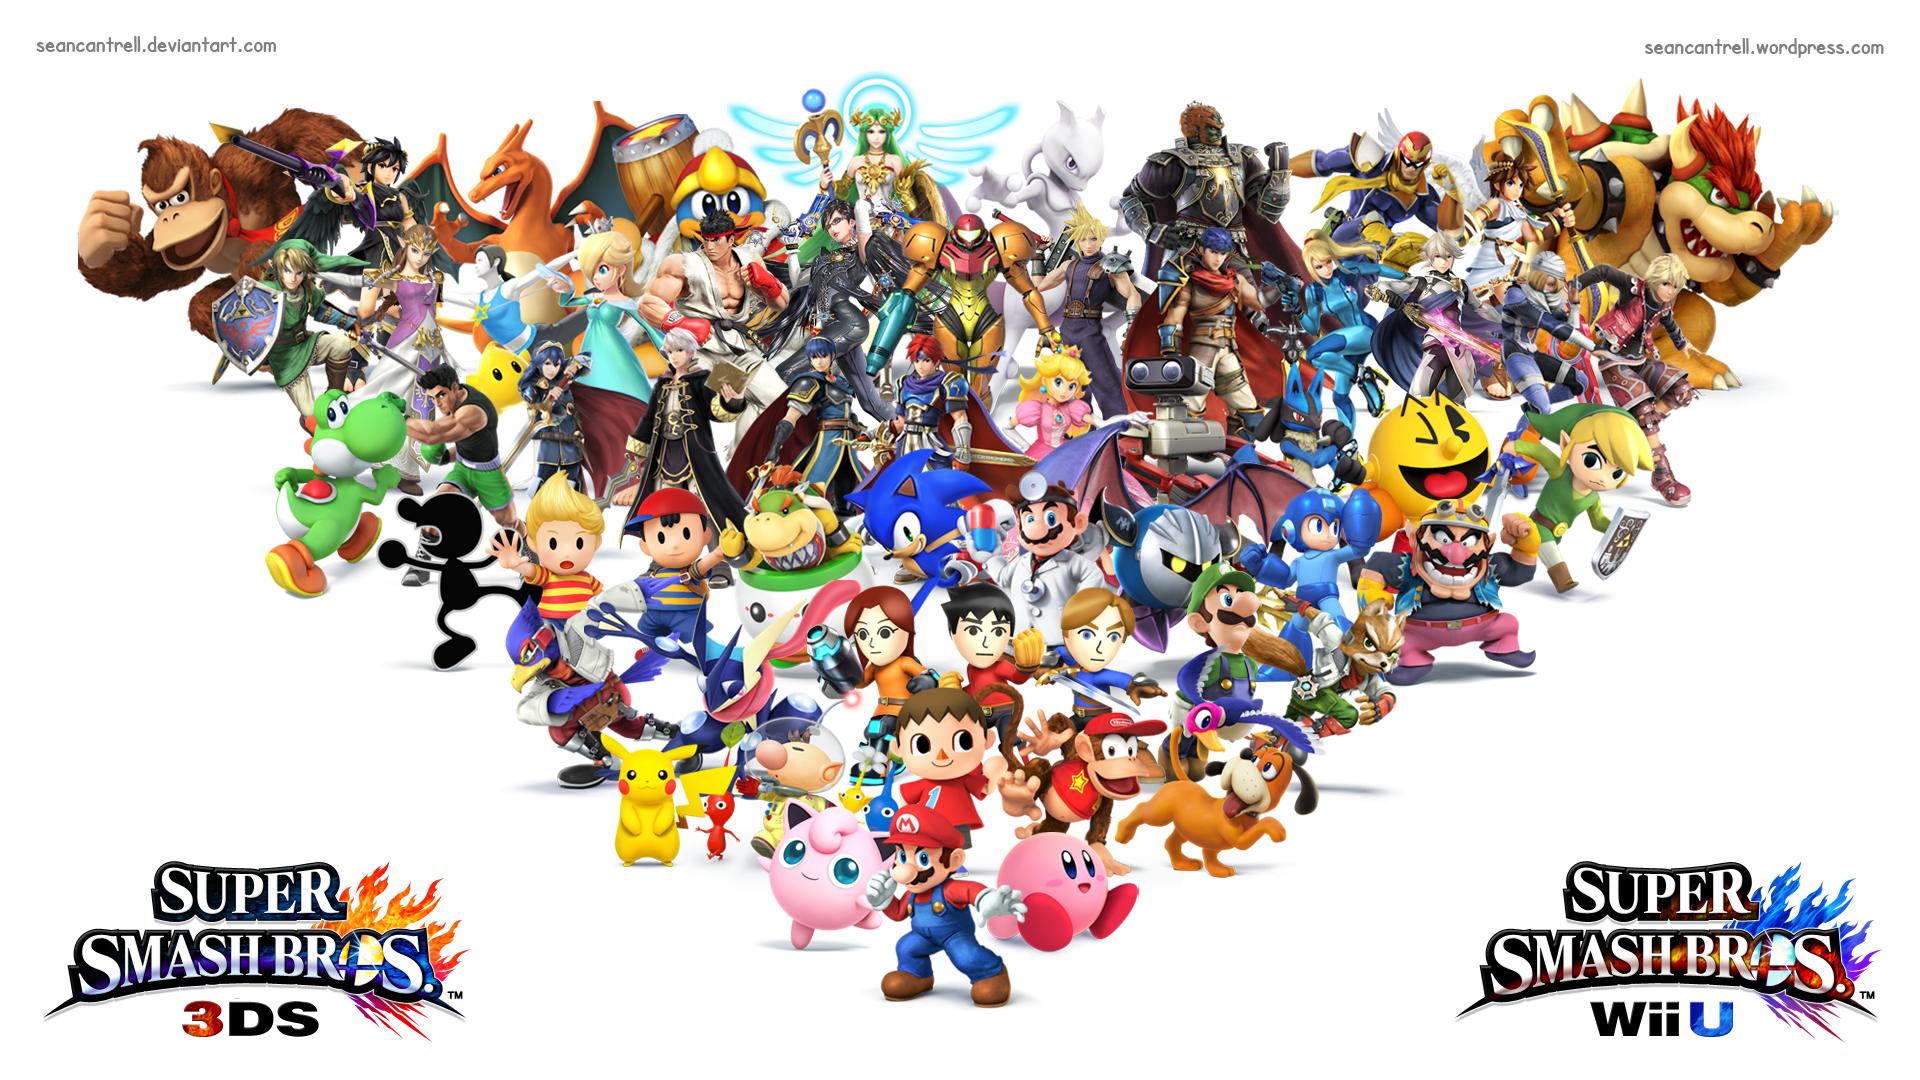 Smash Bros Wii U : Super smash bros wii u ds wallpaper by seancantrell on